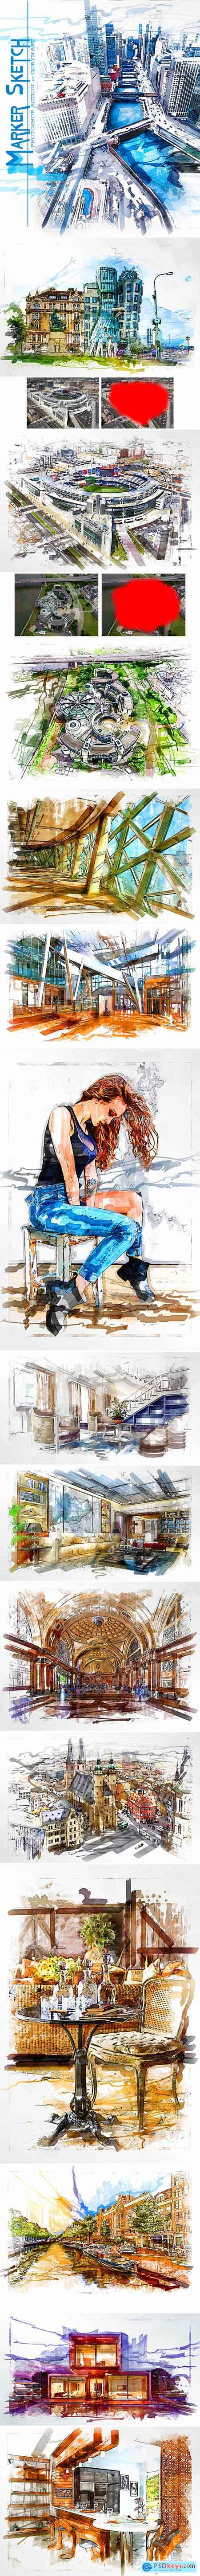 Marker Sketch Photoshop Action 24303447